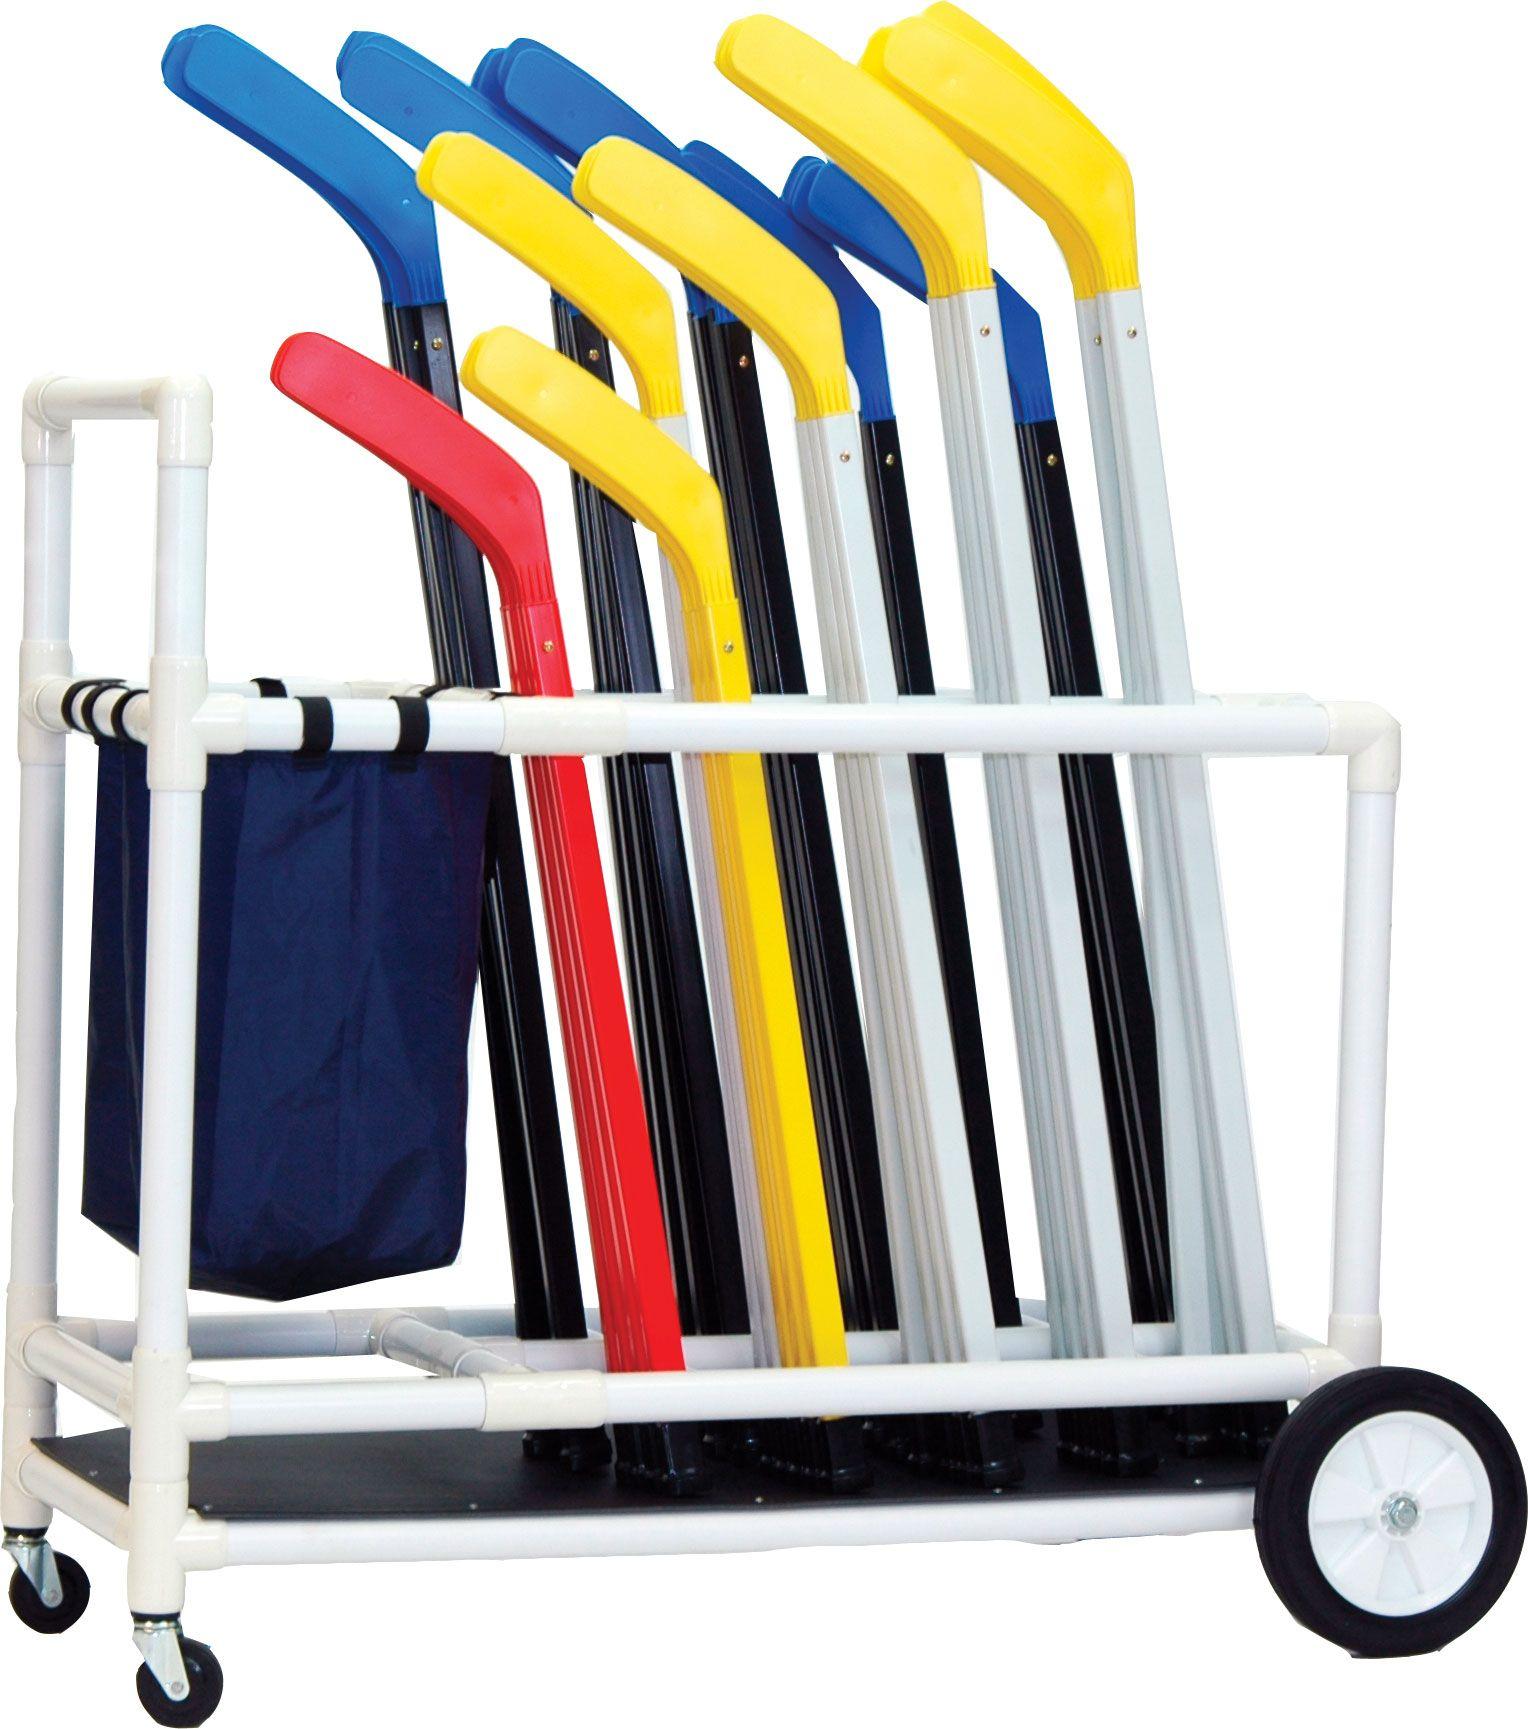 Physical Education Hockey Hockey Cart (con imágenes